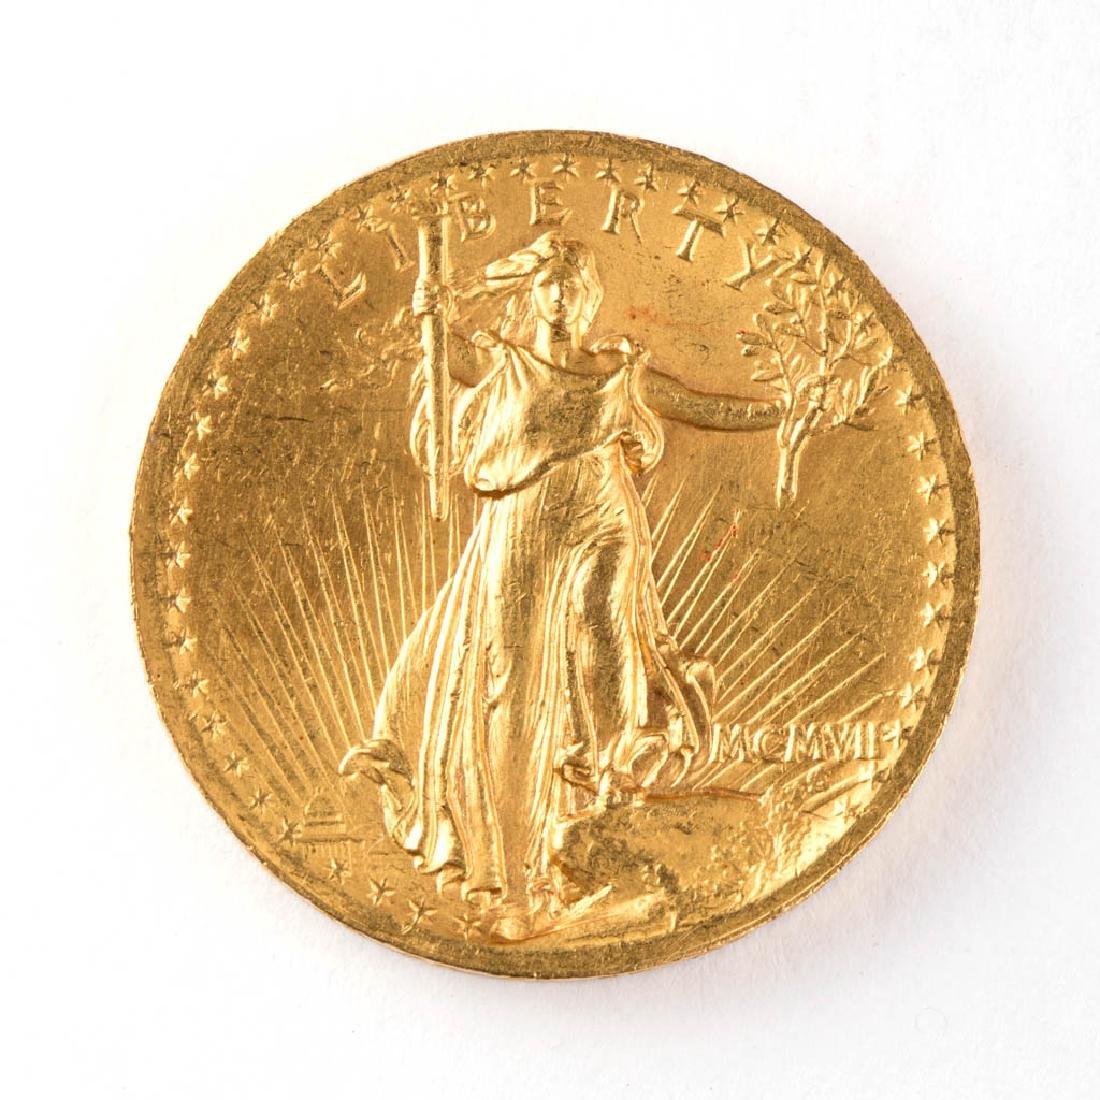 UNITED STATES 1907 $20 SAINT GAUDENS HIGH-RELIEF